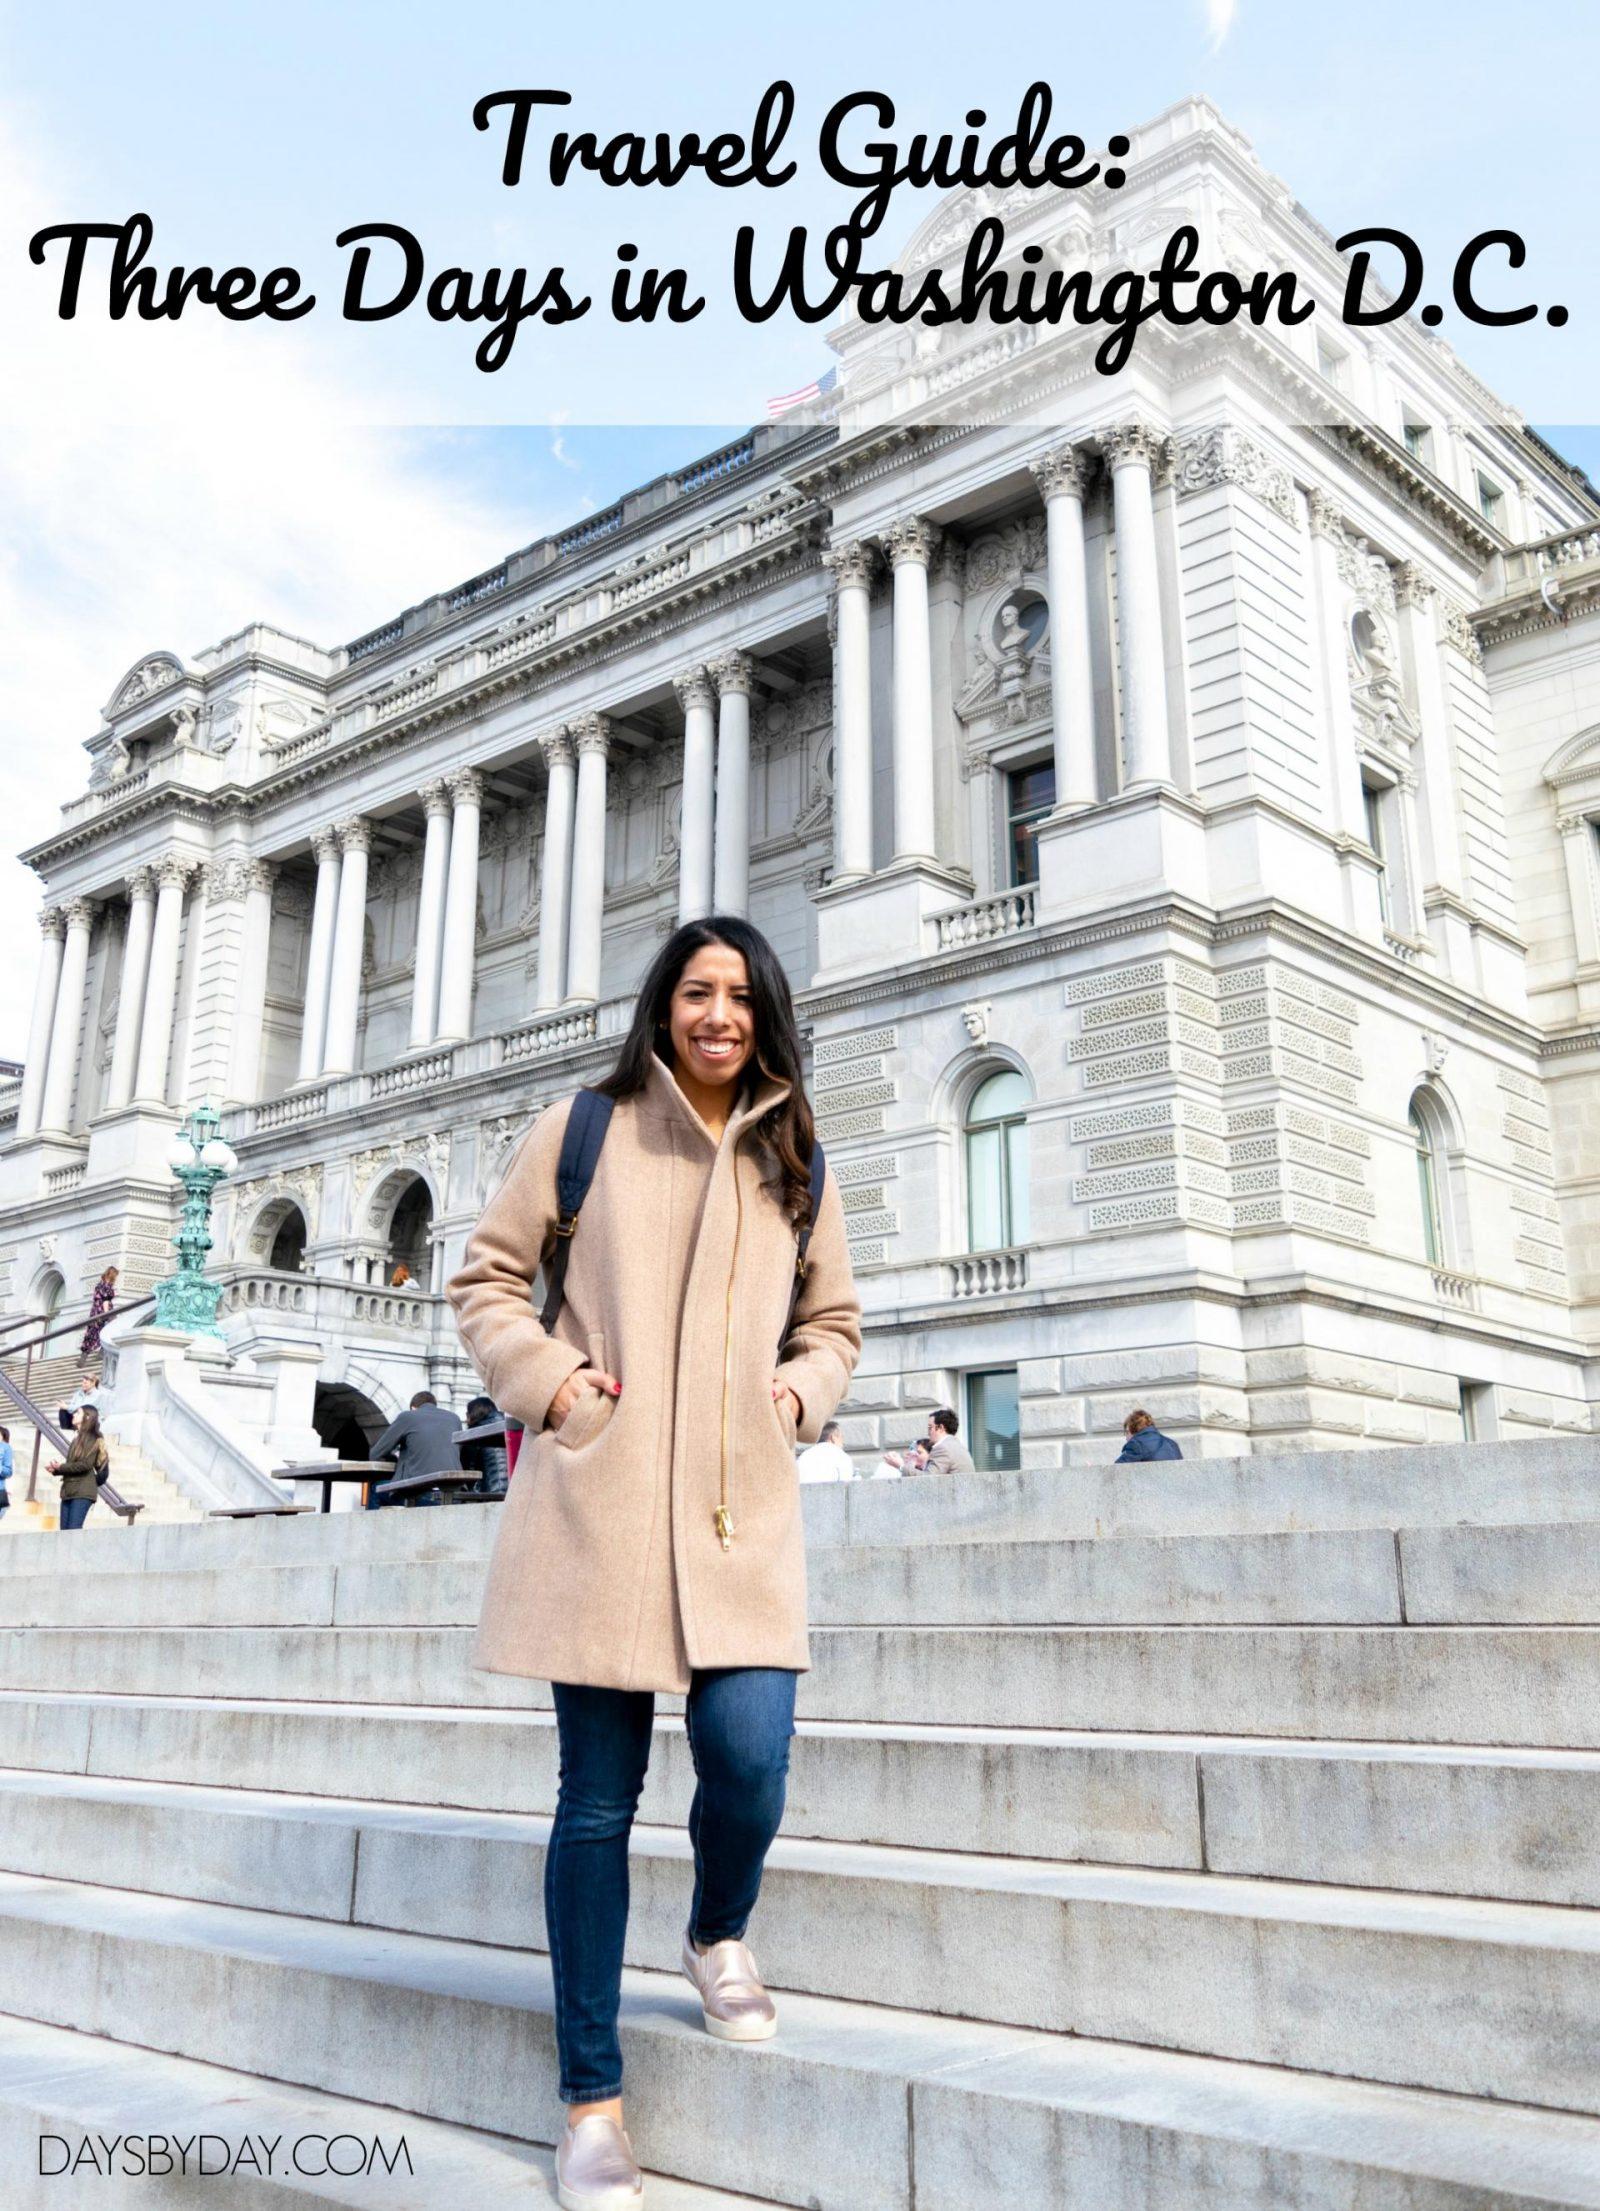 Travel Guide: Three Days in Washington D.C.